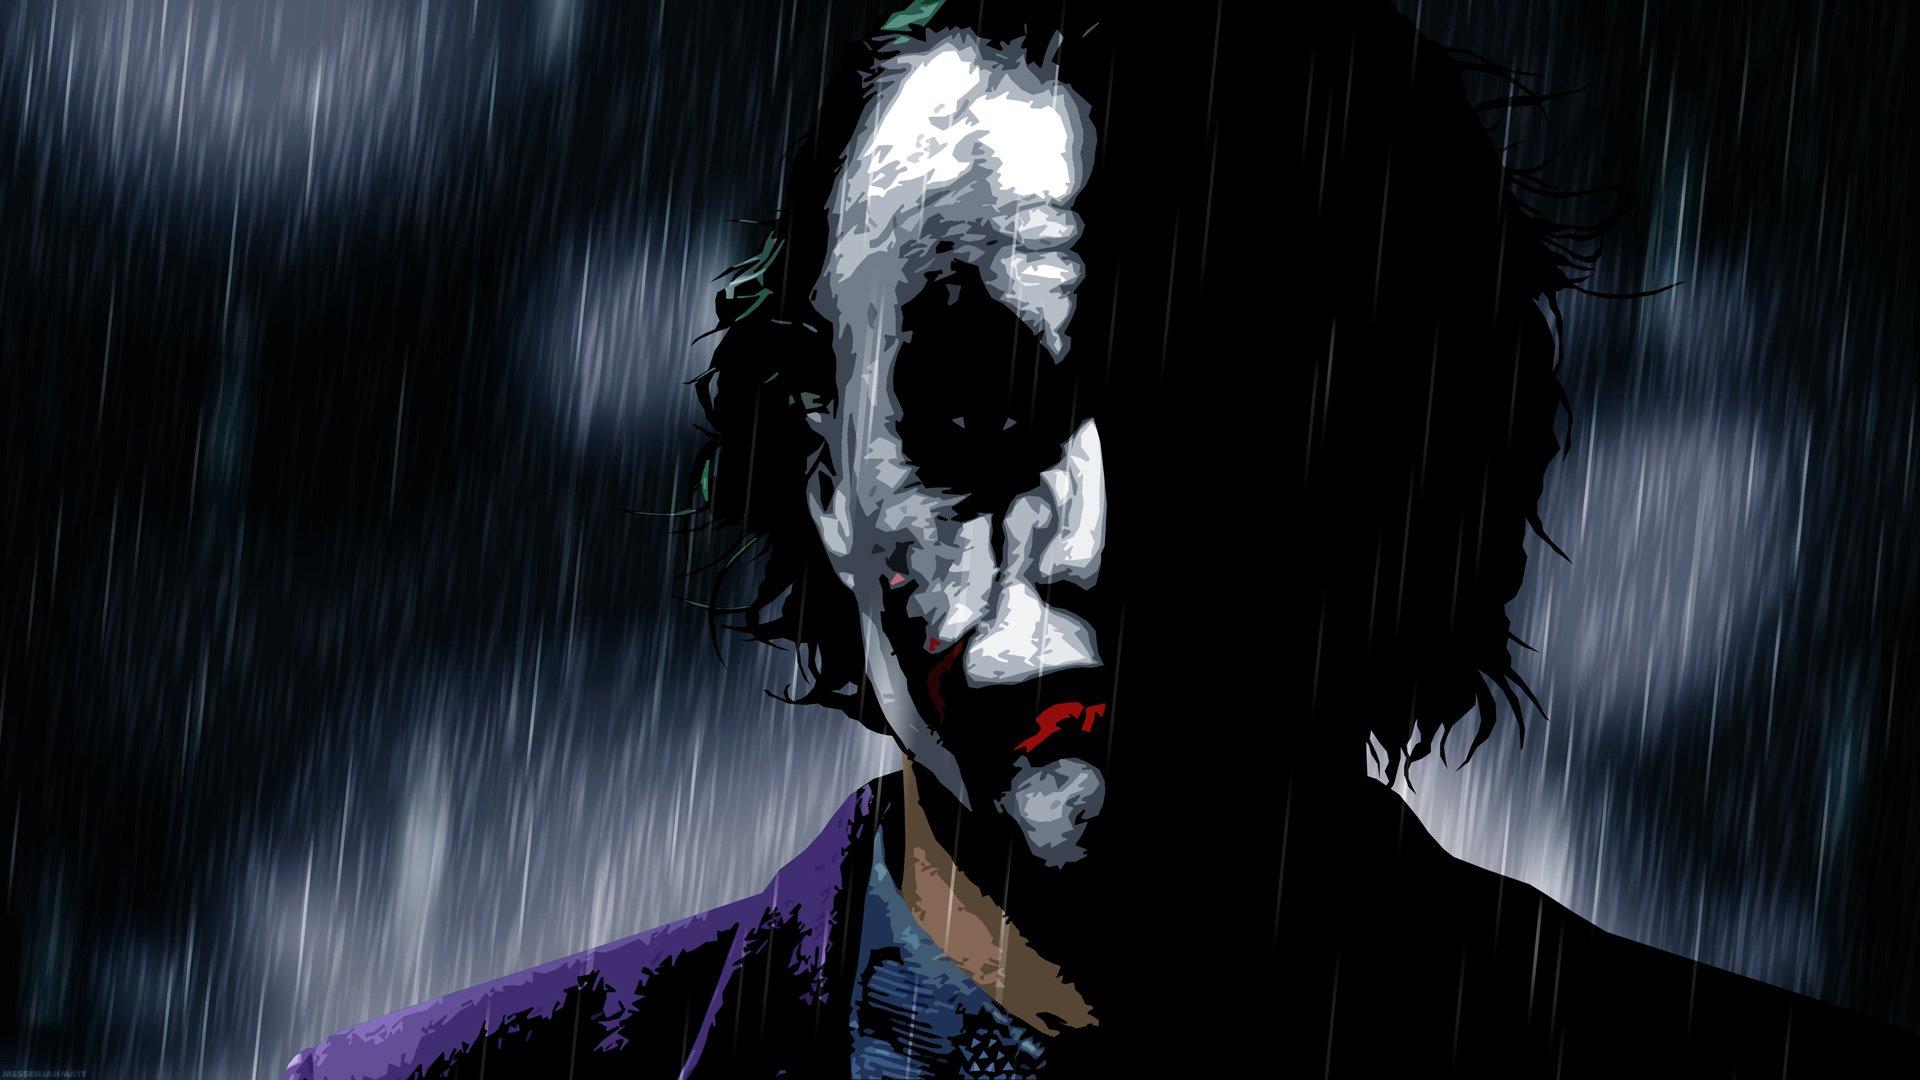 Fondos de pantalla Joker - Guason